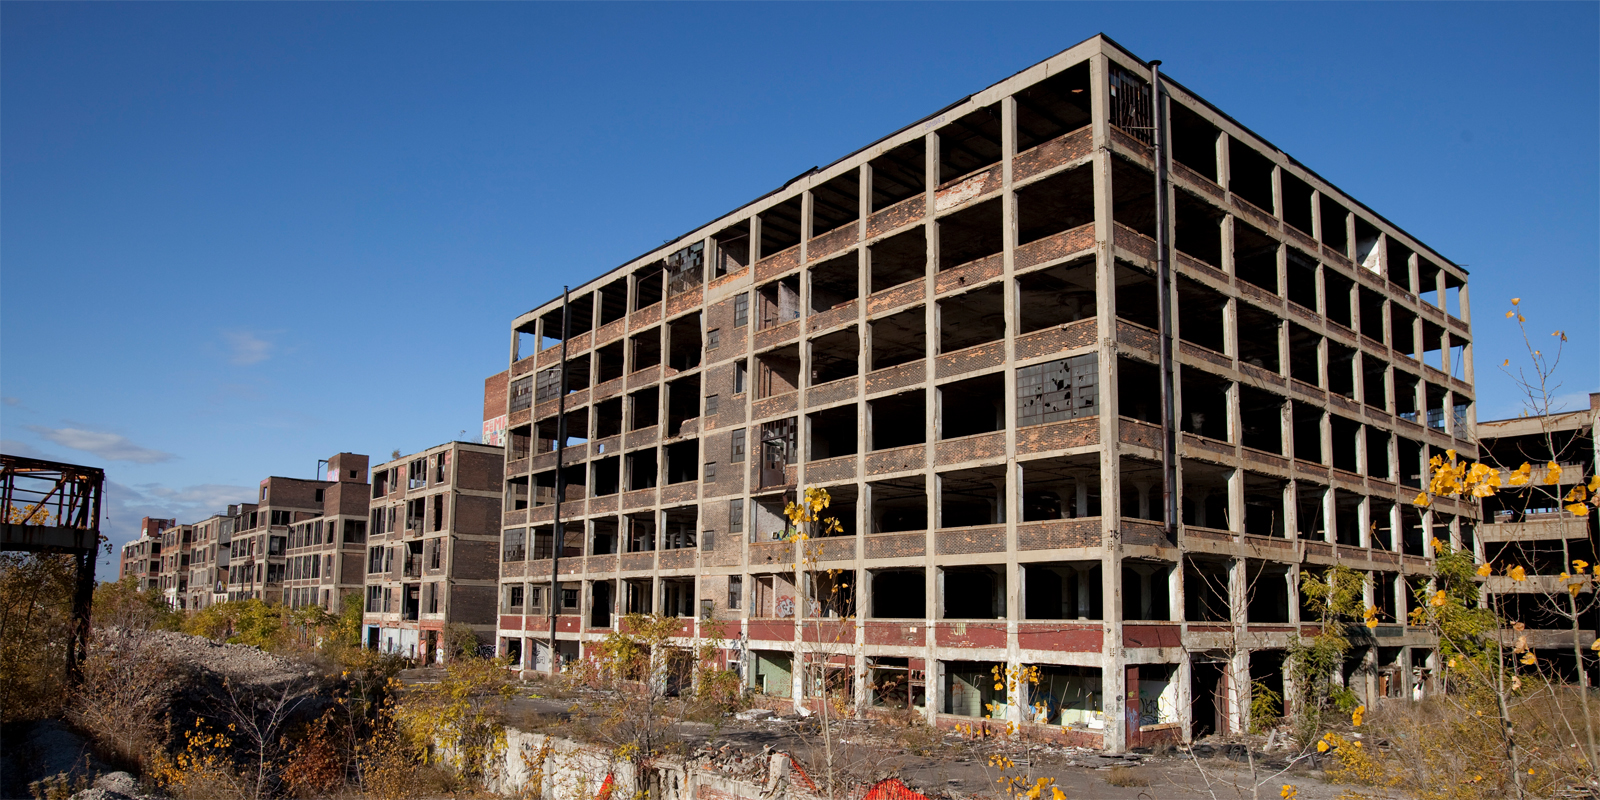 Abandoned Packard Automotive Plant in Detroit, Michigan. Via Wikimedia.